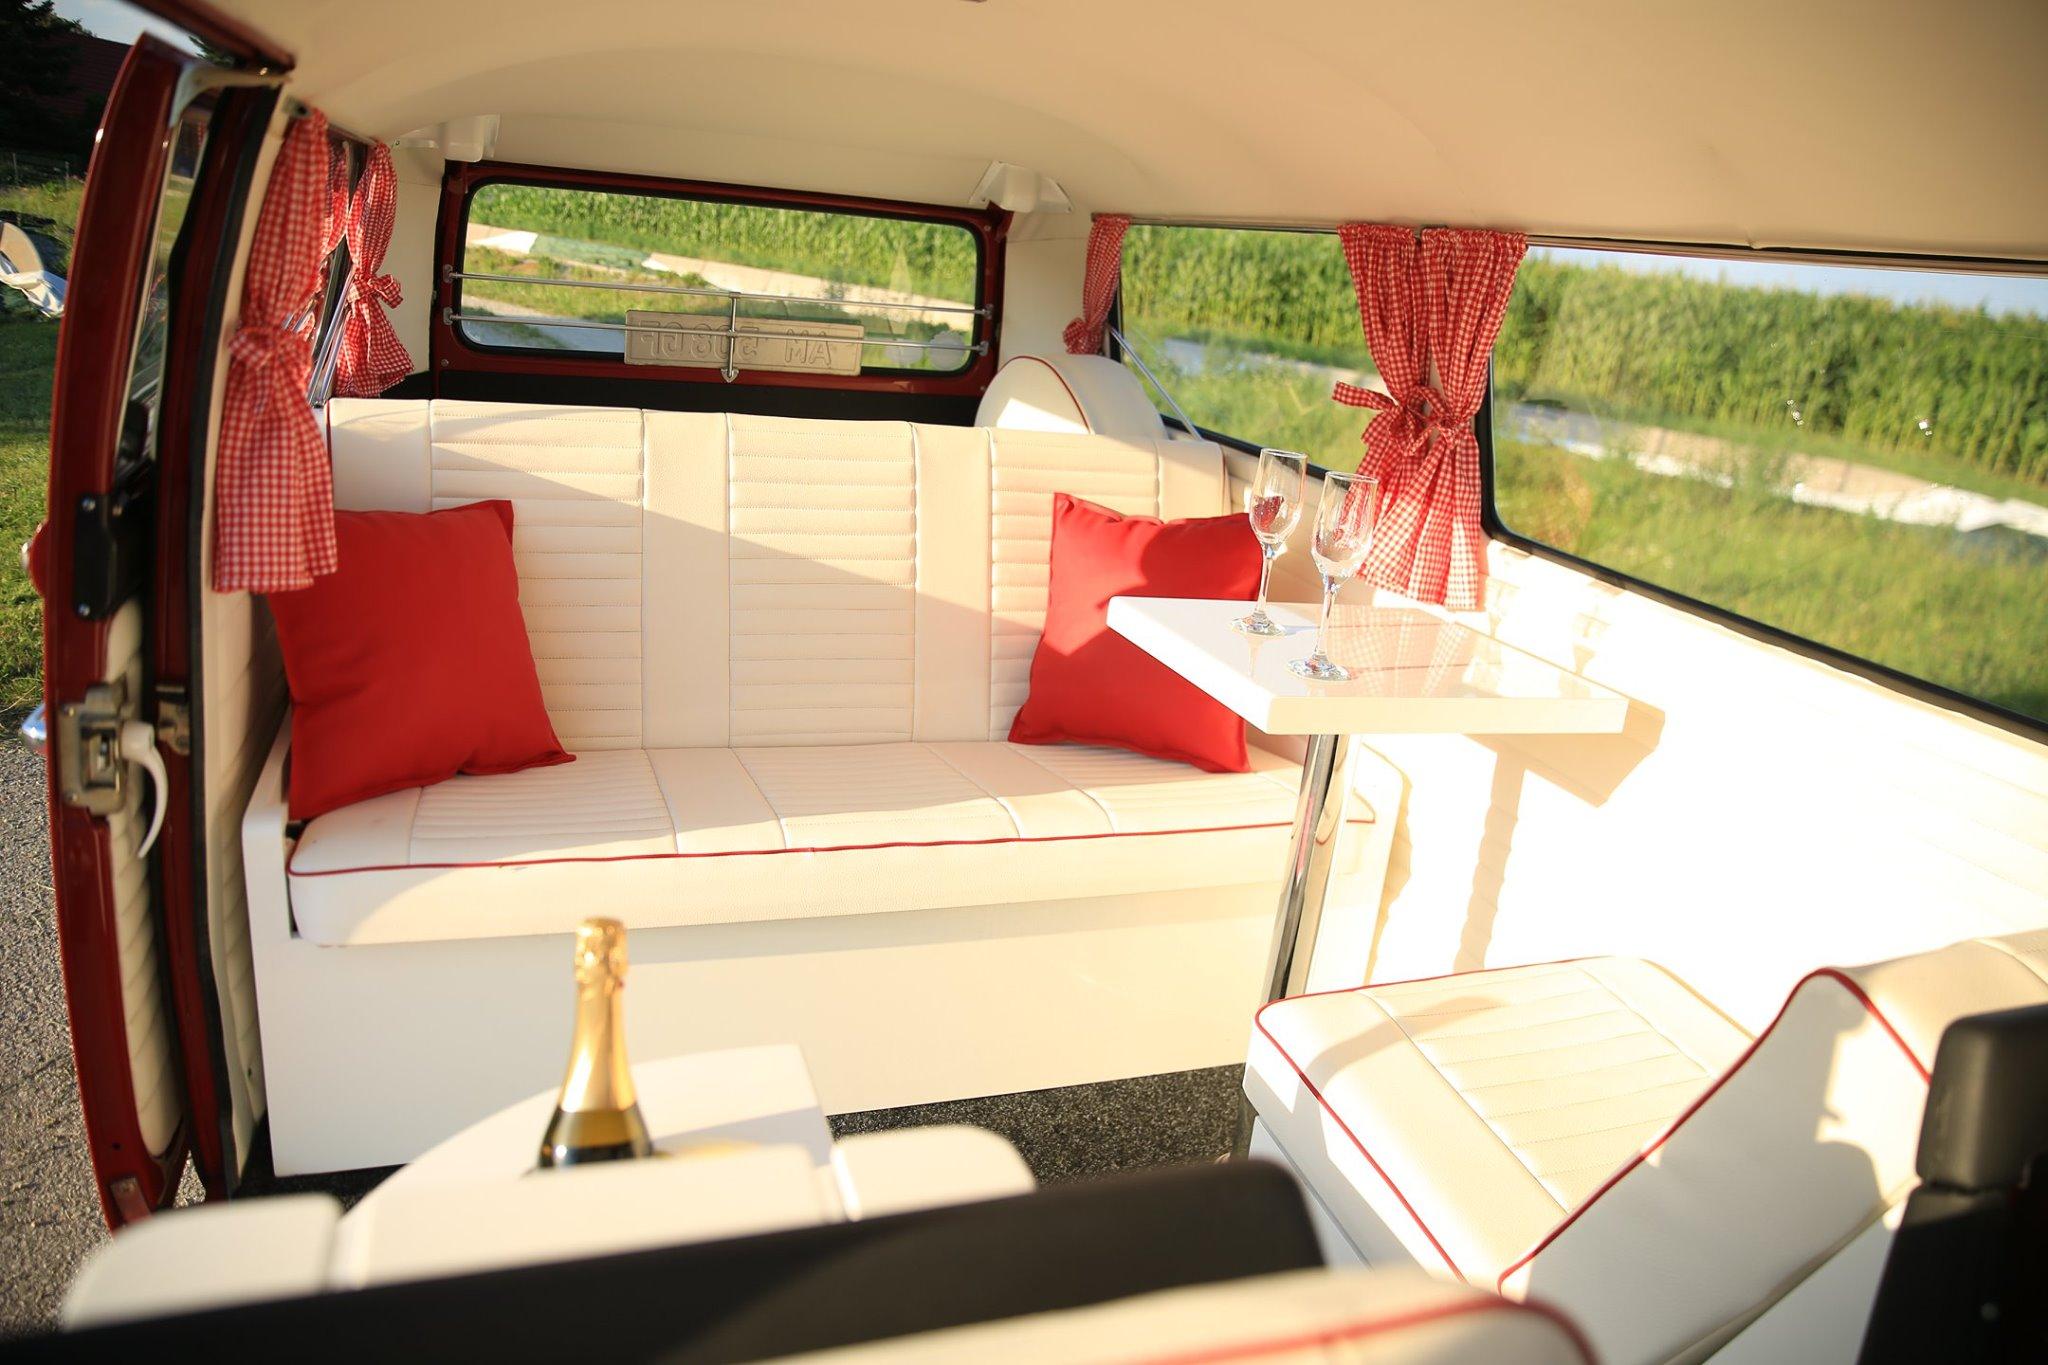 Retrobus-Hochzeitsbulli-VW-Bus-Oldtimerb